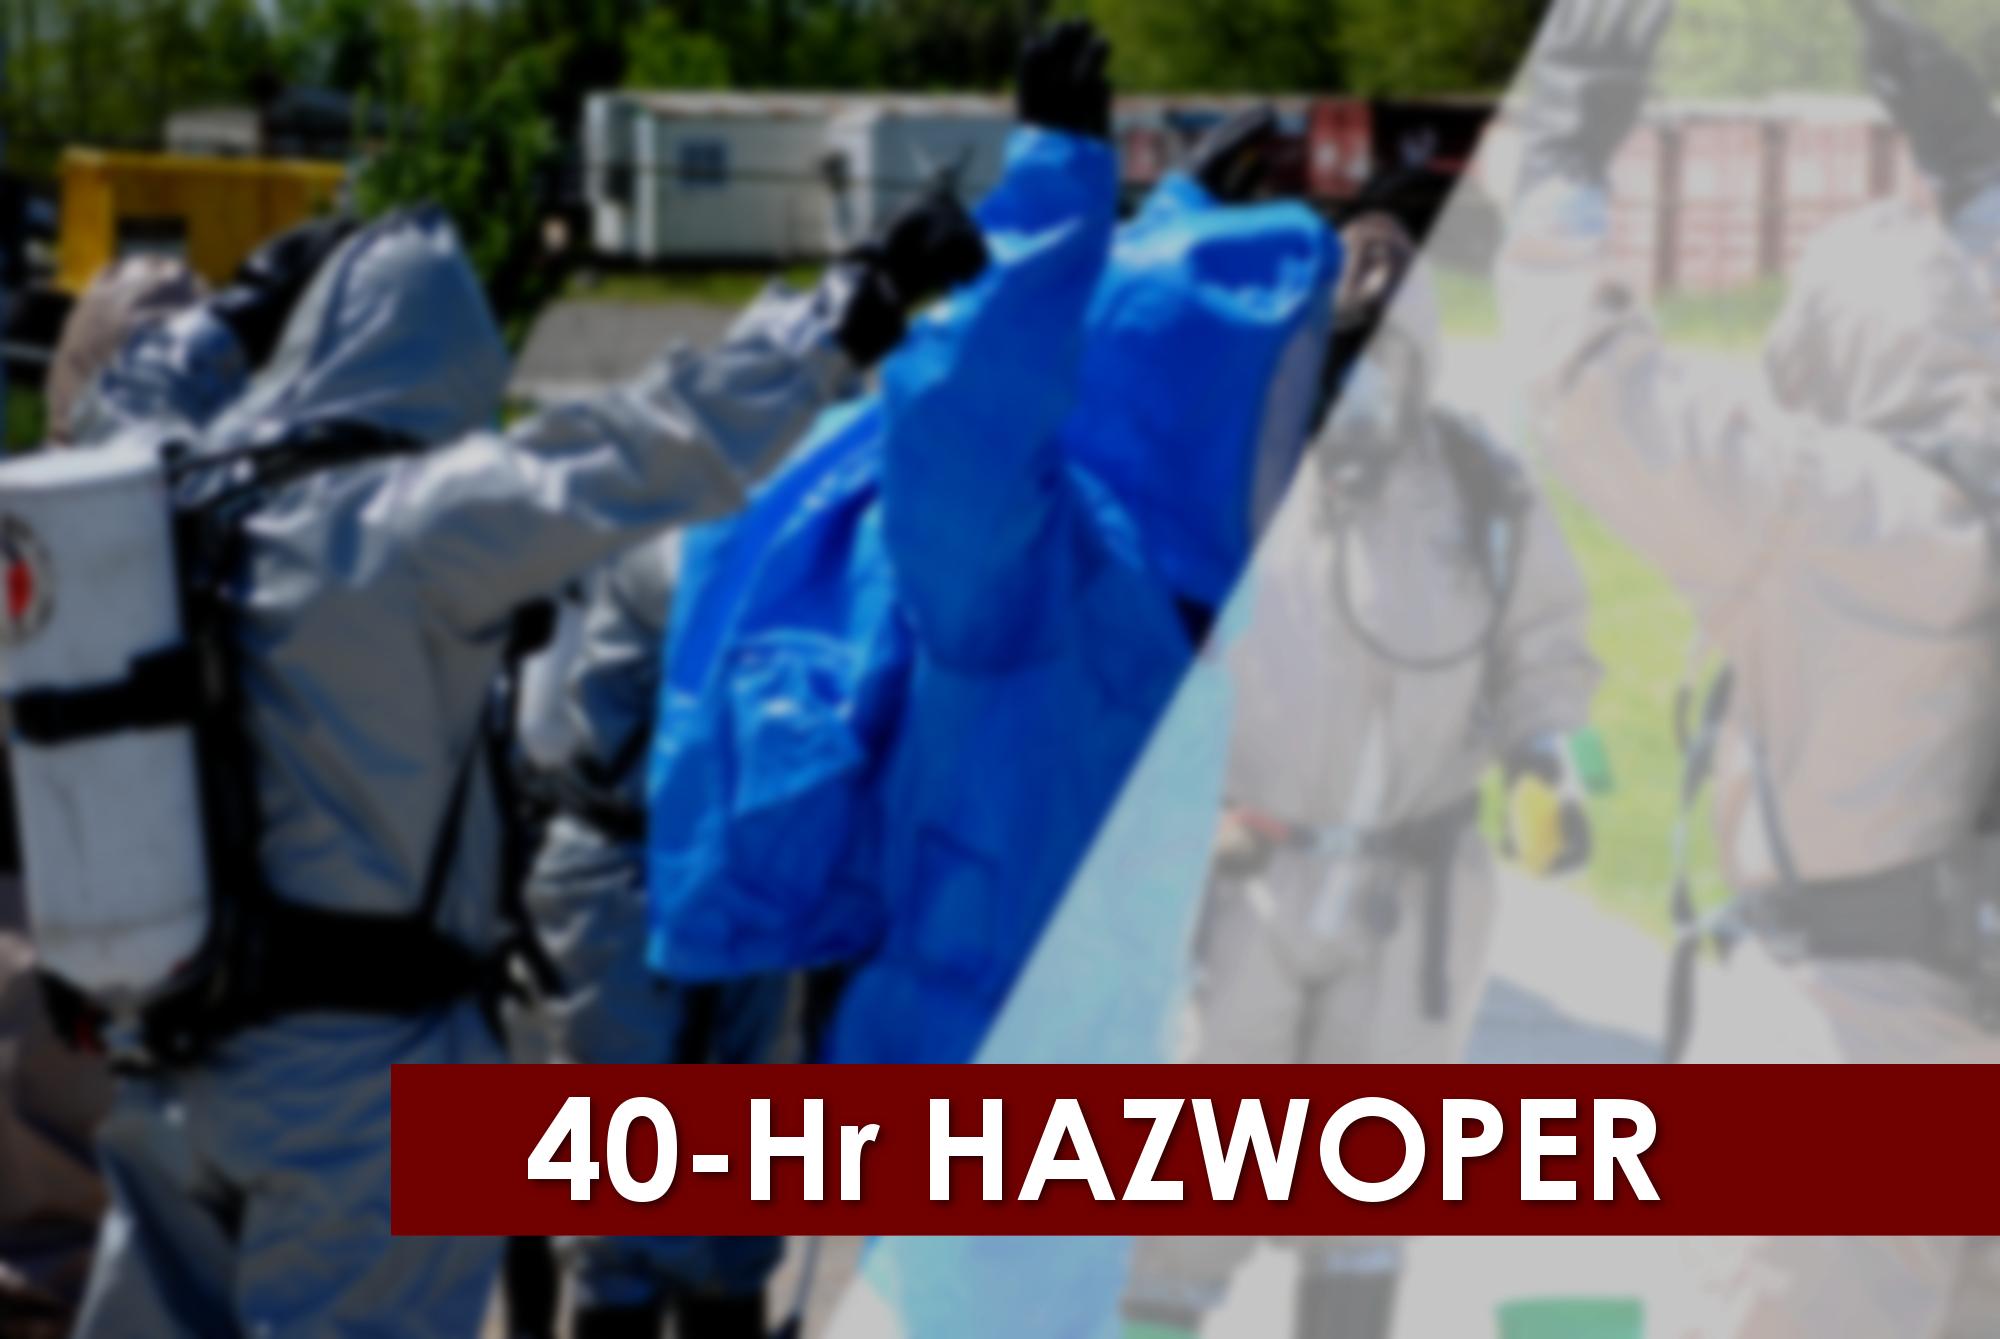 HAZWOPER Training